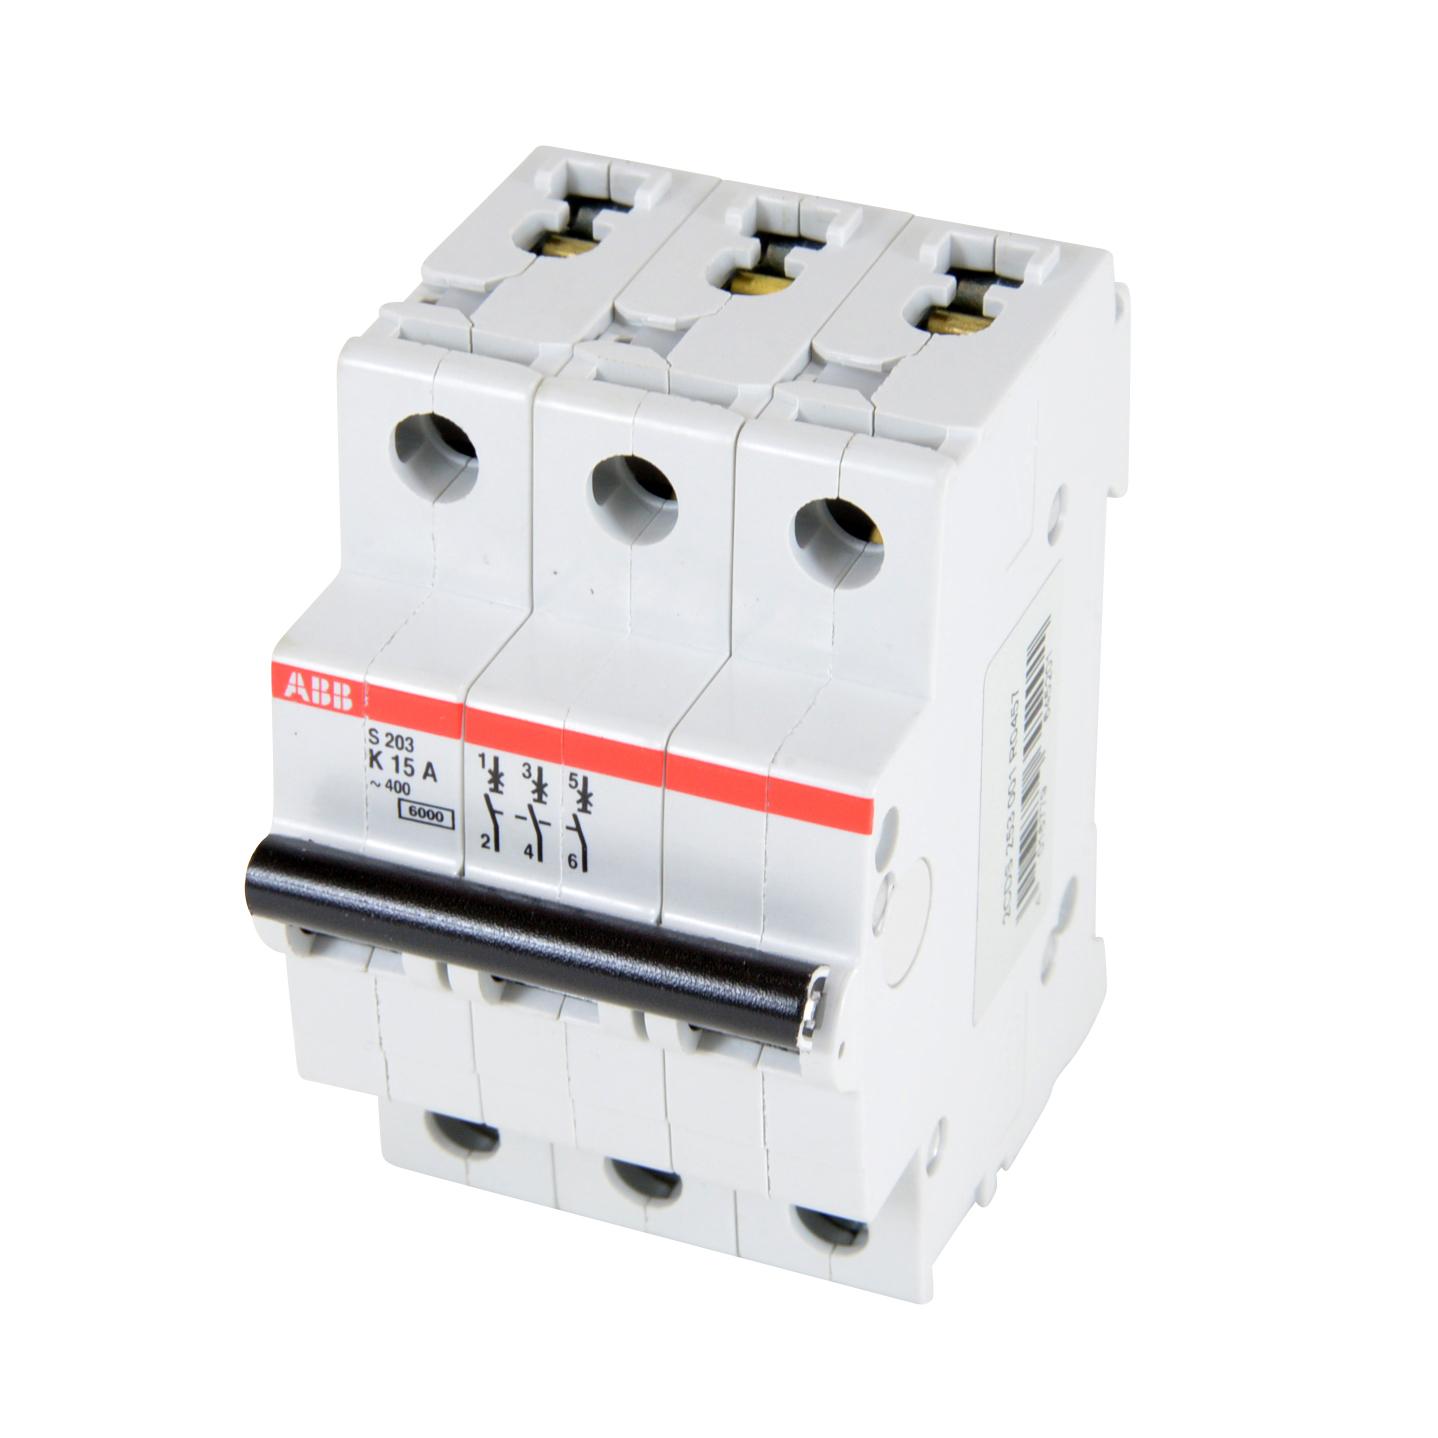 ABB,S203-K15,ABB S200 Miniature Circuit Breaker, 277/480 VAC, 15 A, 6 kA Interrupt, 3 Poles, Thermal Magnetic Trip